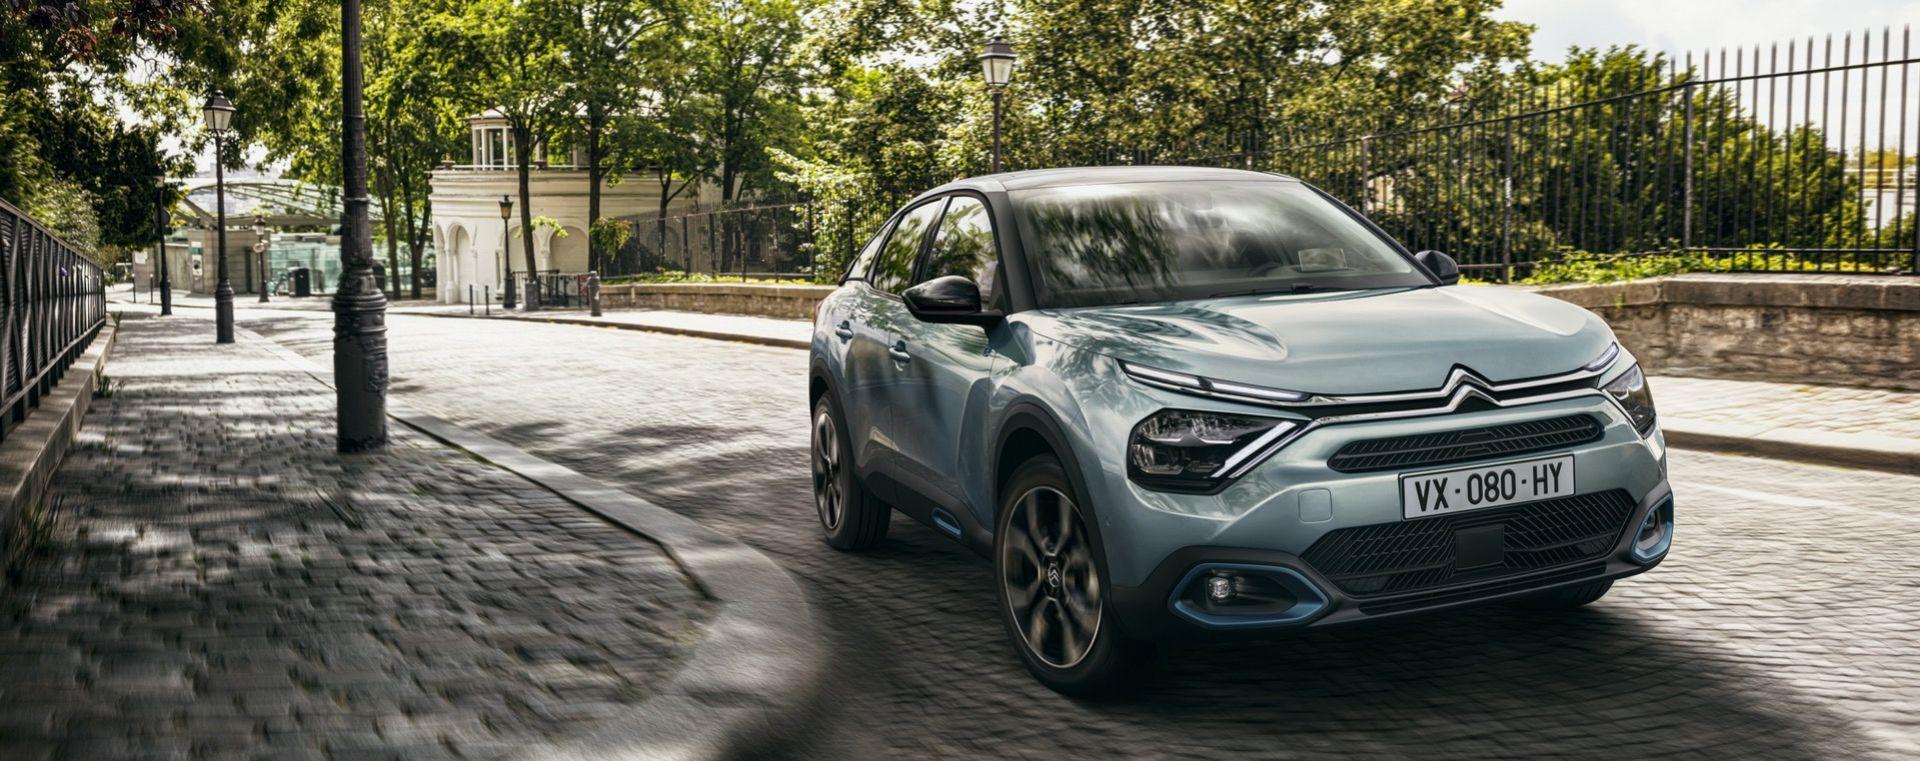 Citroën presenterar mer kring nya C4